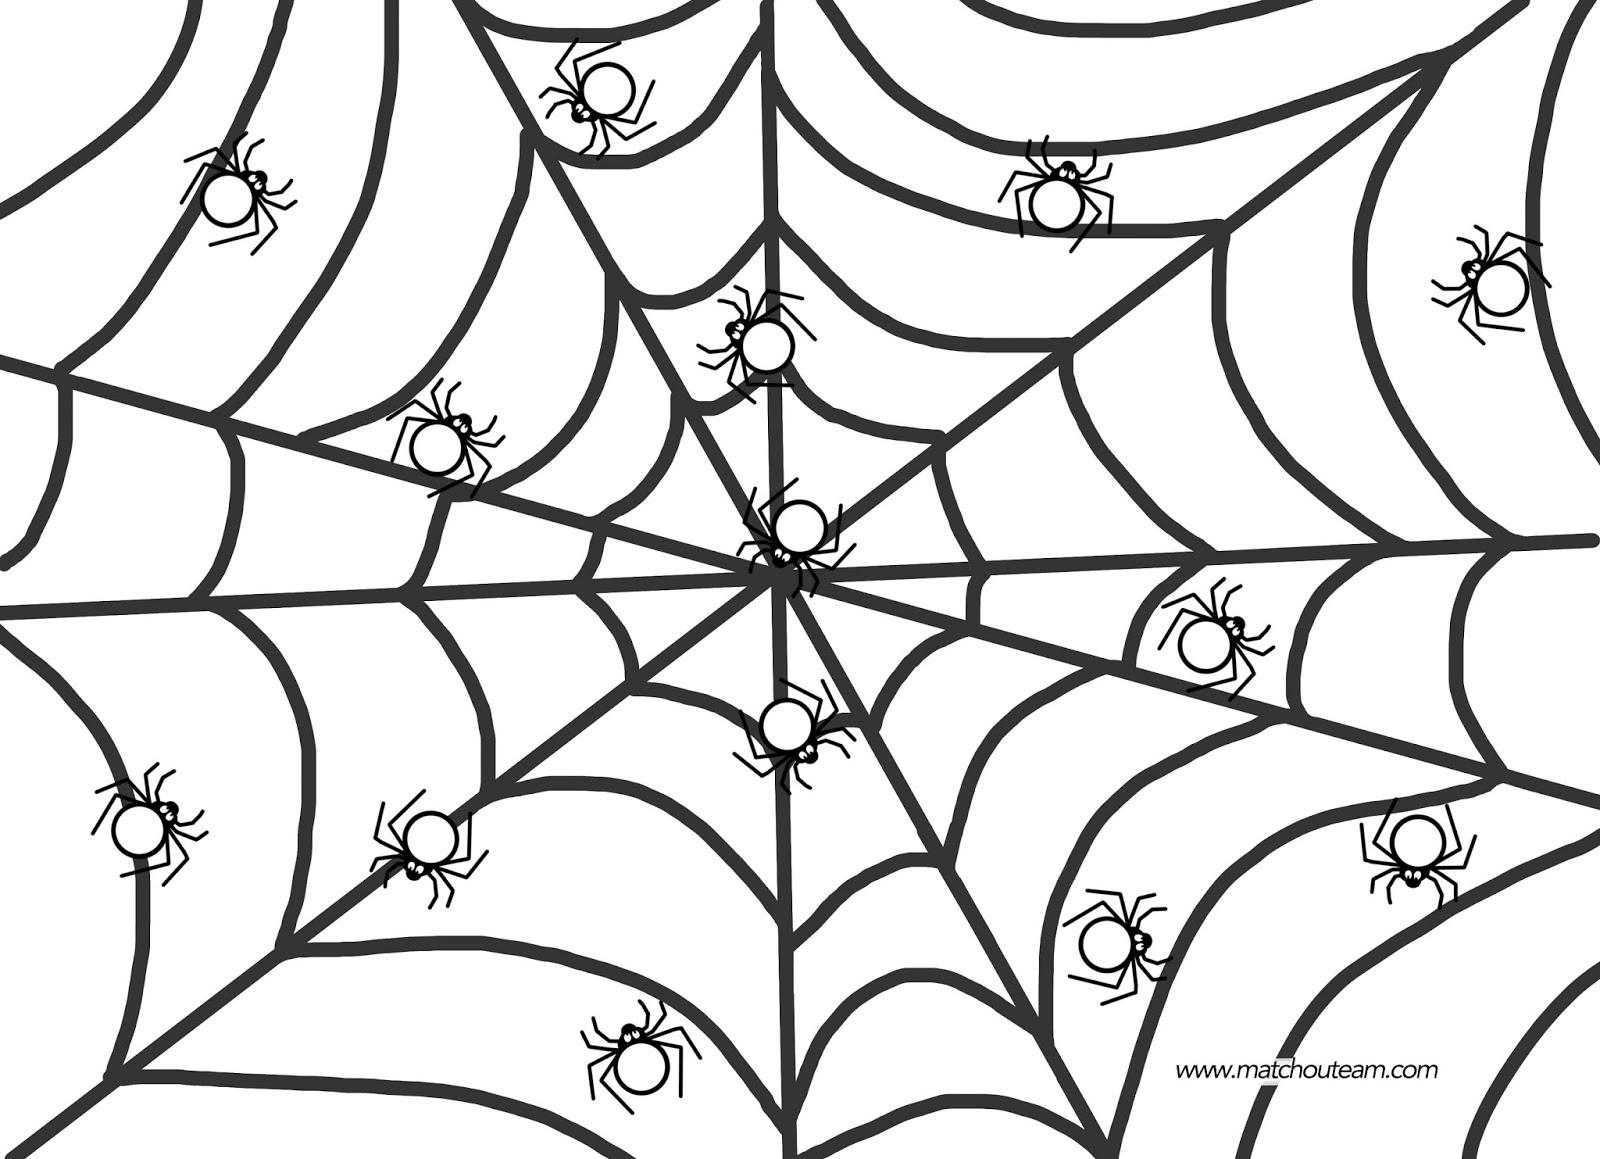 fiches halloween à imprimer